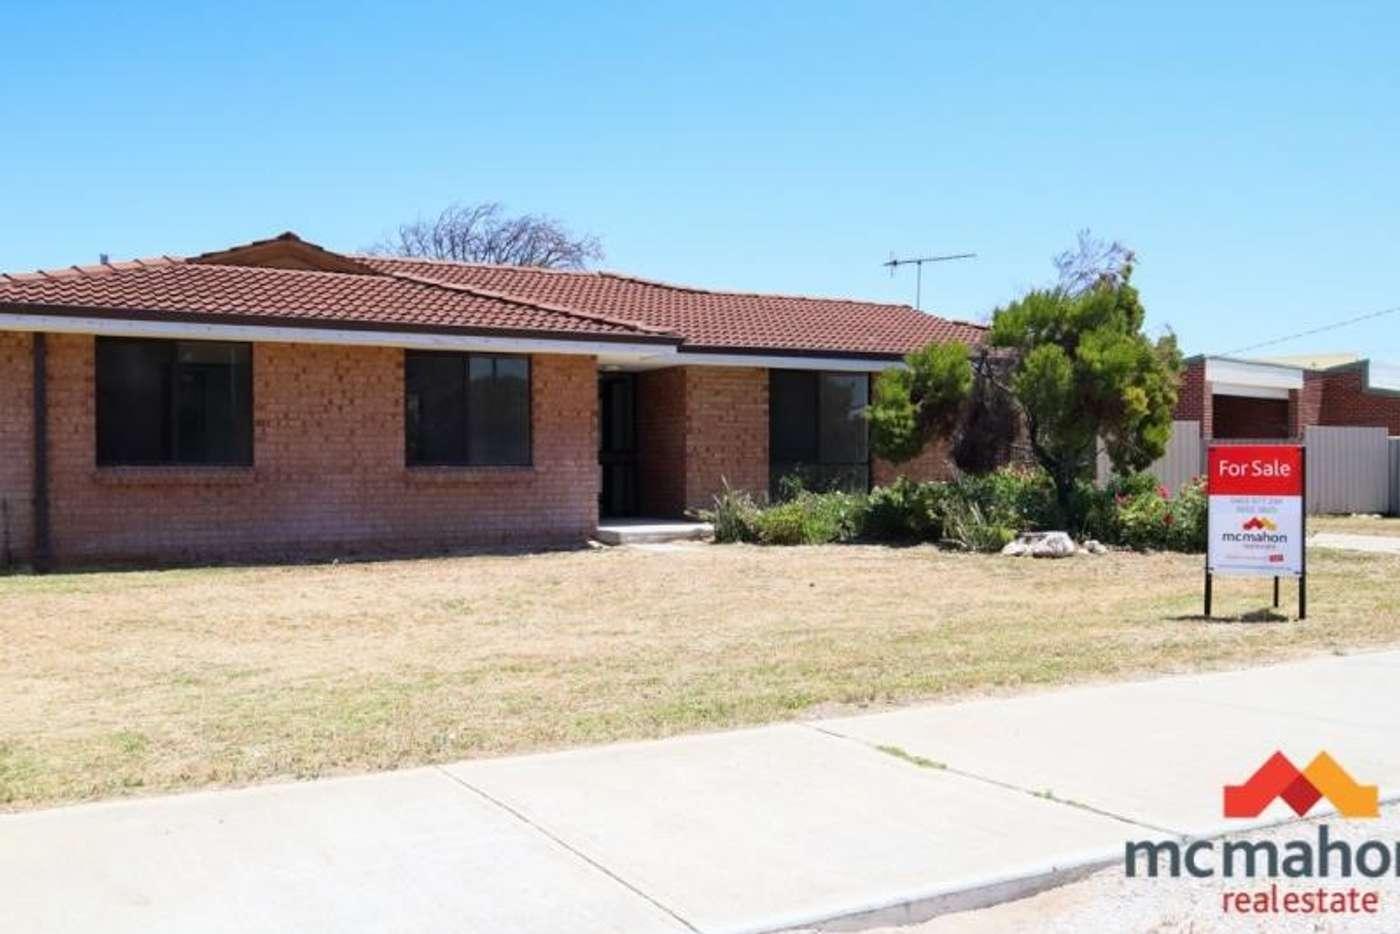 Main view of Homely house listing, 35 CORDOBA WAY, Cervantes WA 6511